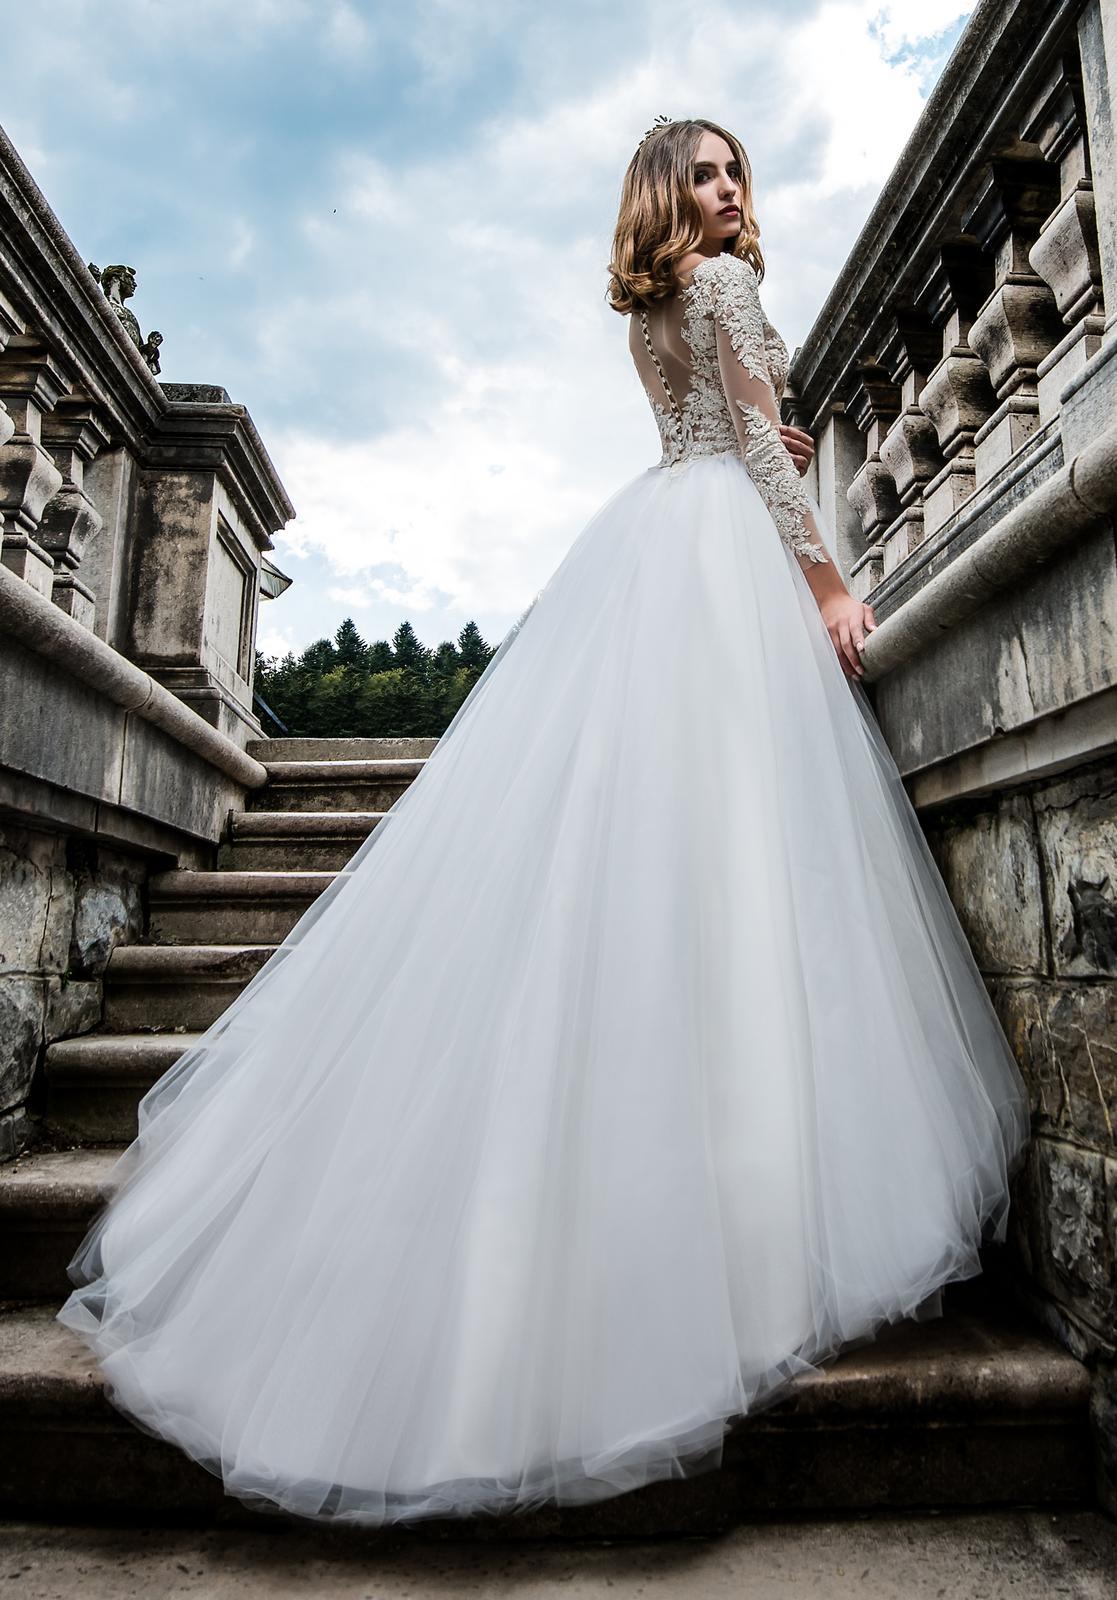 Svadobné šaty s dlhými rukávmi s čipkou 36/38 - Obrázok č. 1